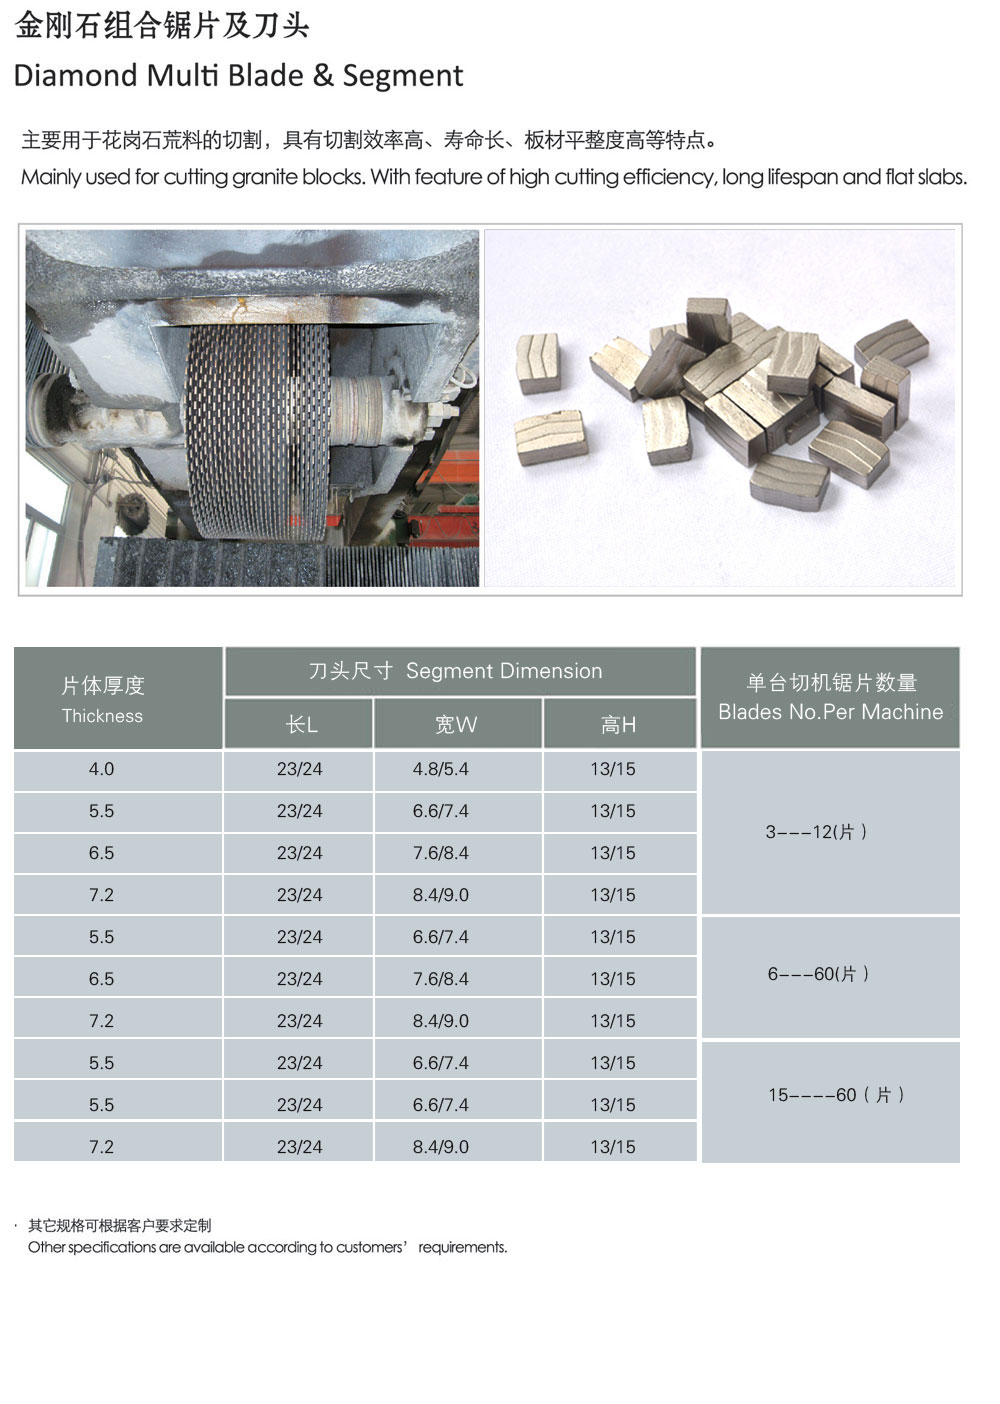 Diamond Multi Blade & Segment